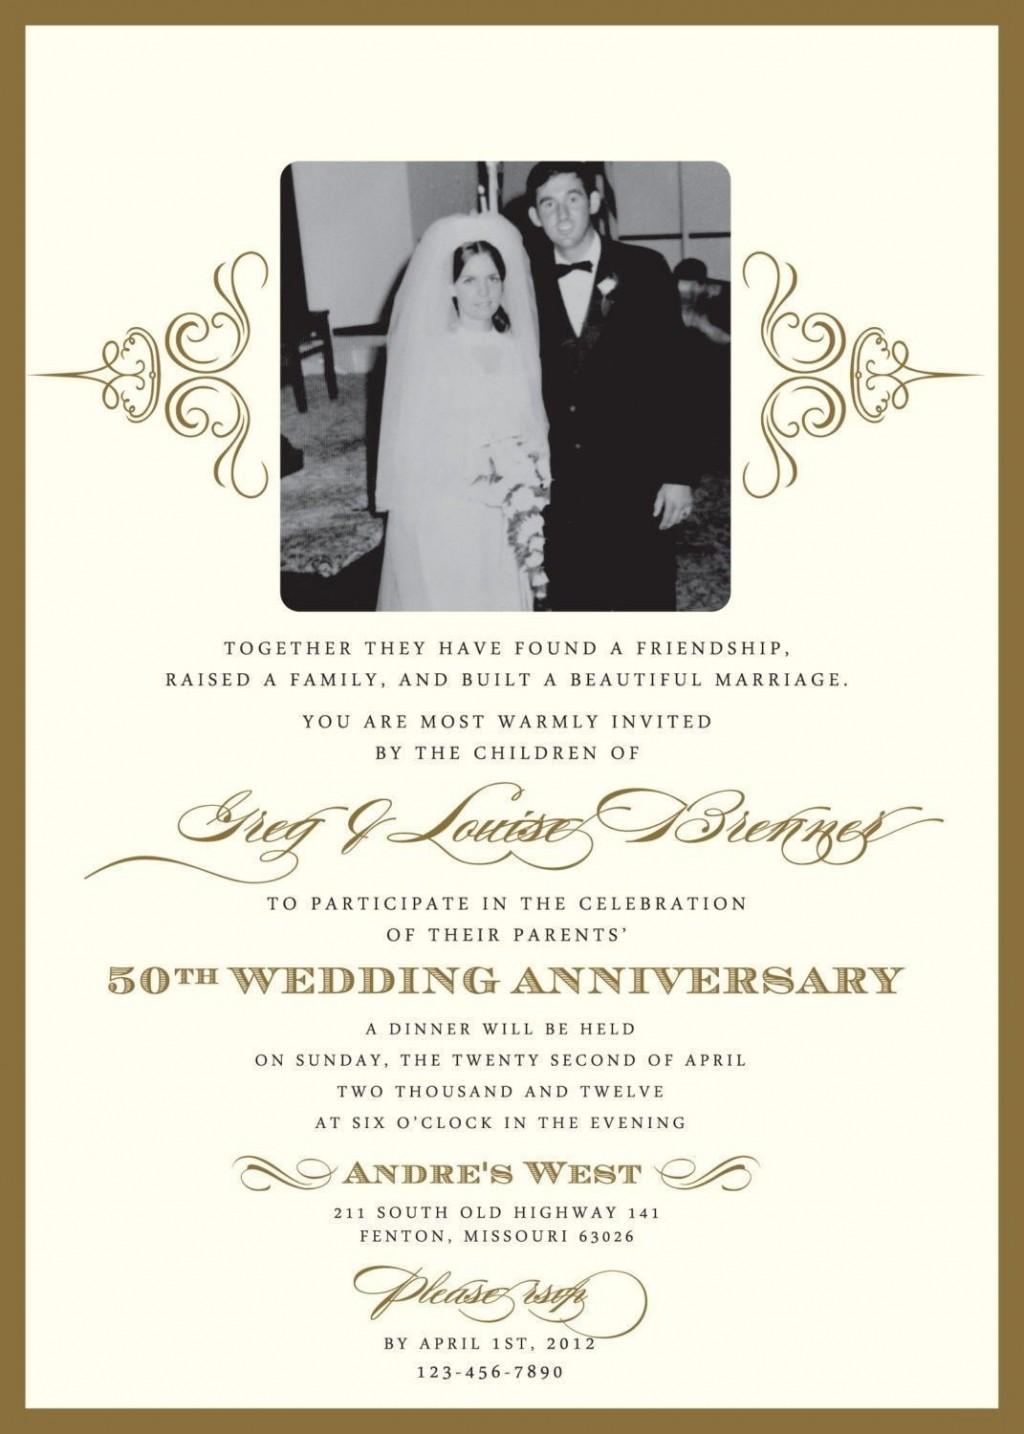 000 Impressive 50th Wedding Anniversary Invitation Card Template Picture  Templates SampleLarge